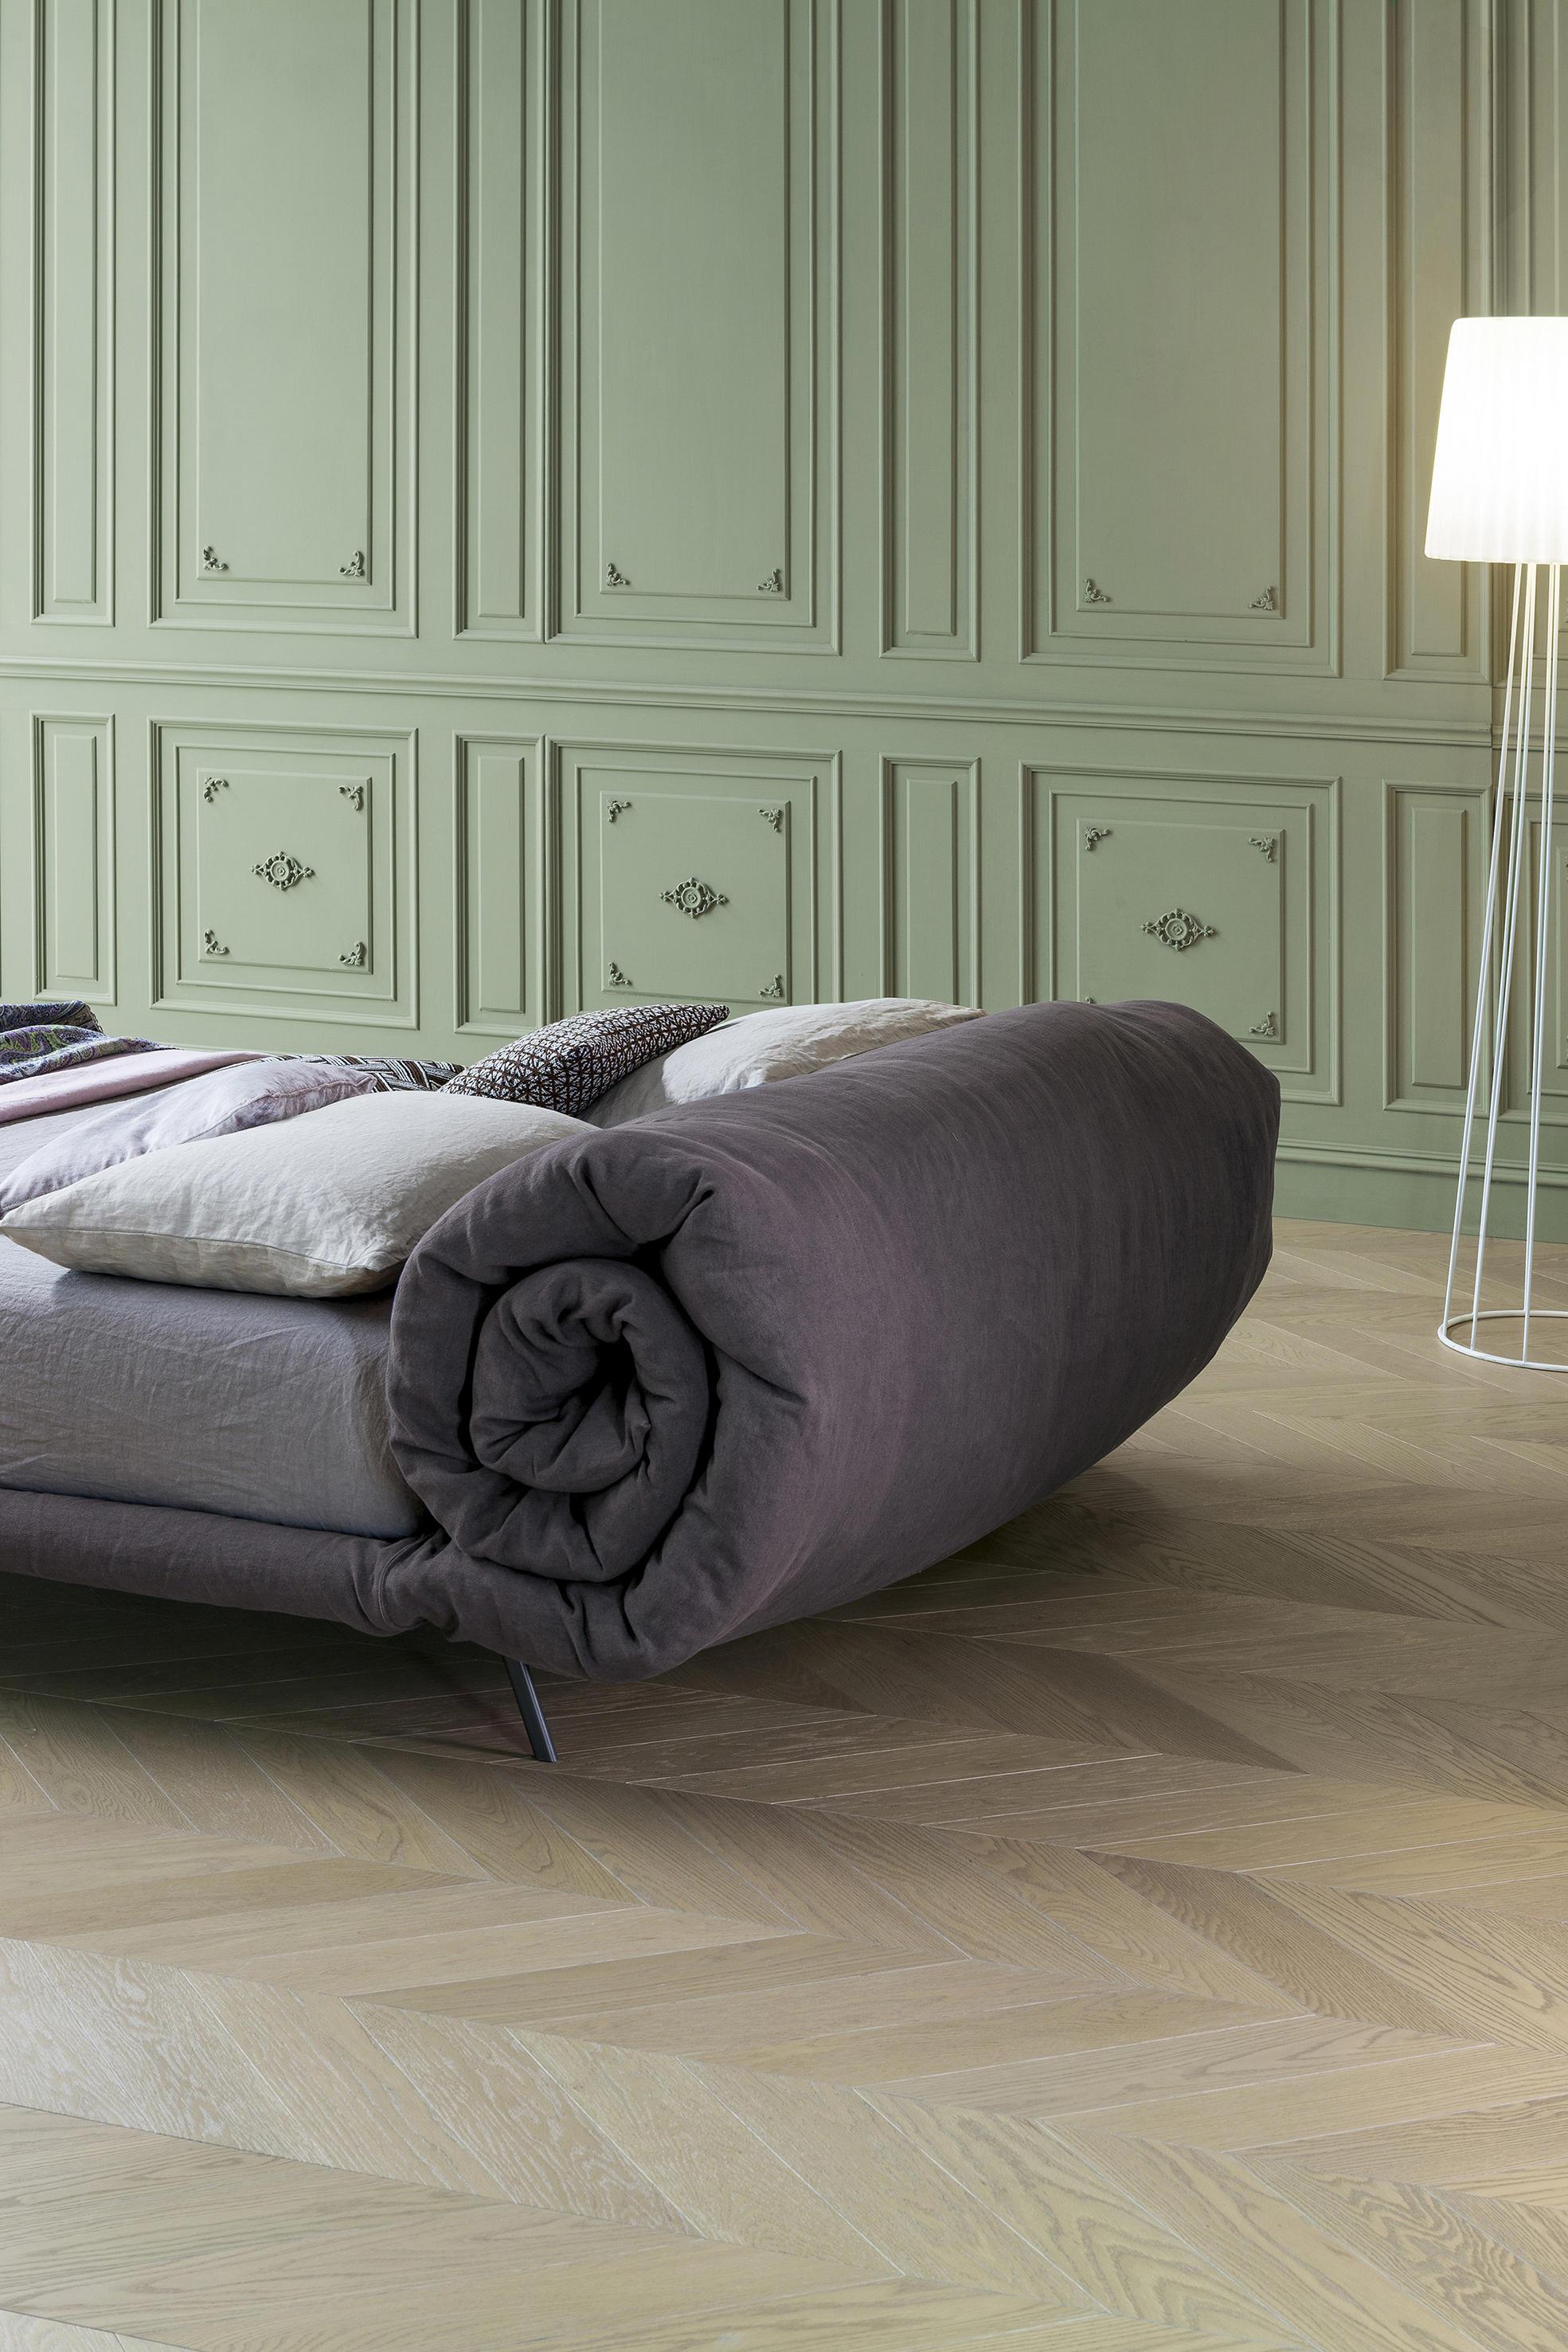 Blanket Bed by Alessandro Busana for Bonaldo